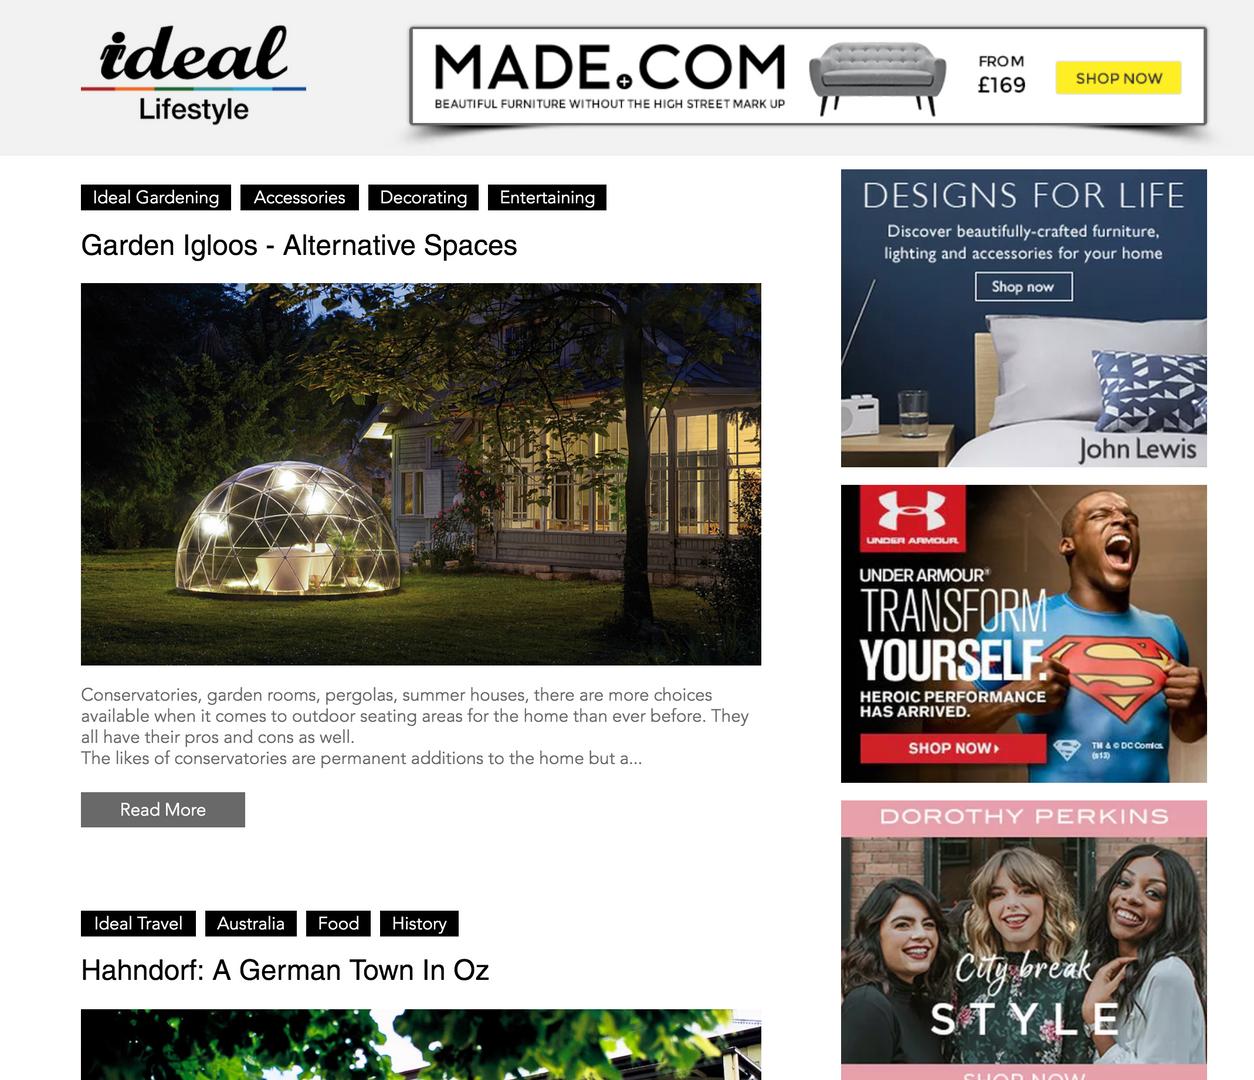 Ideal Lifestyle Blog